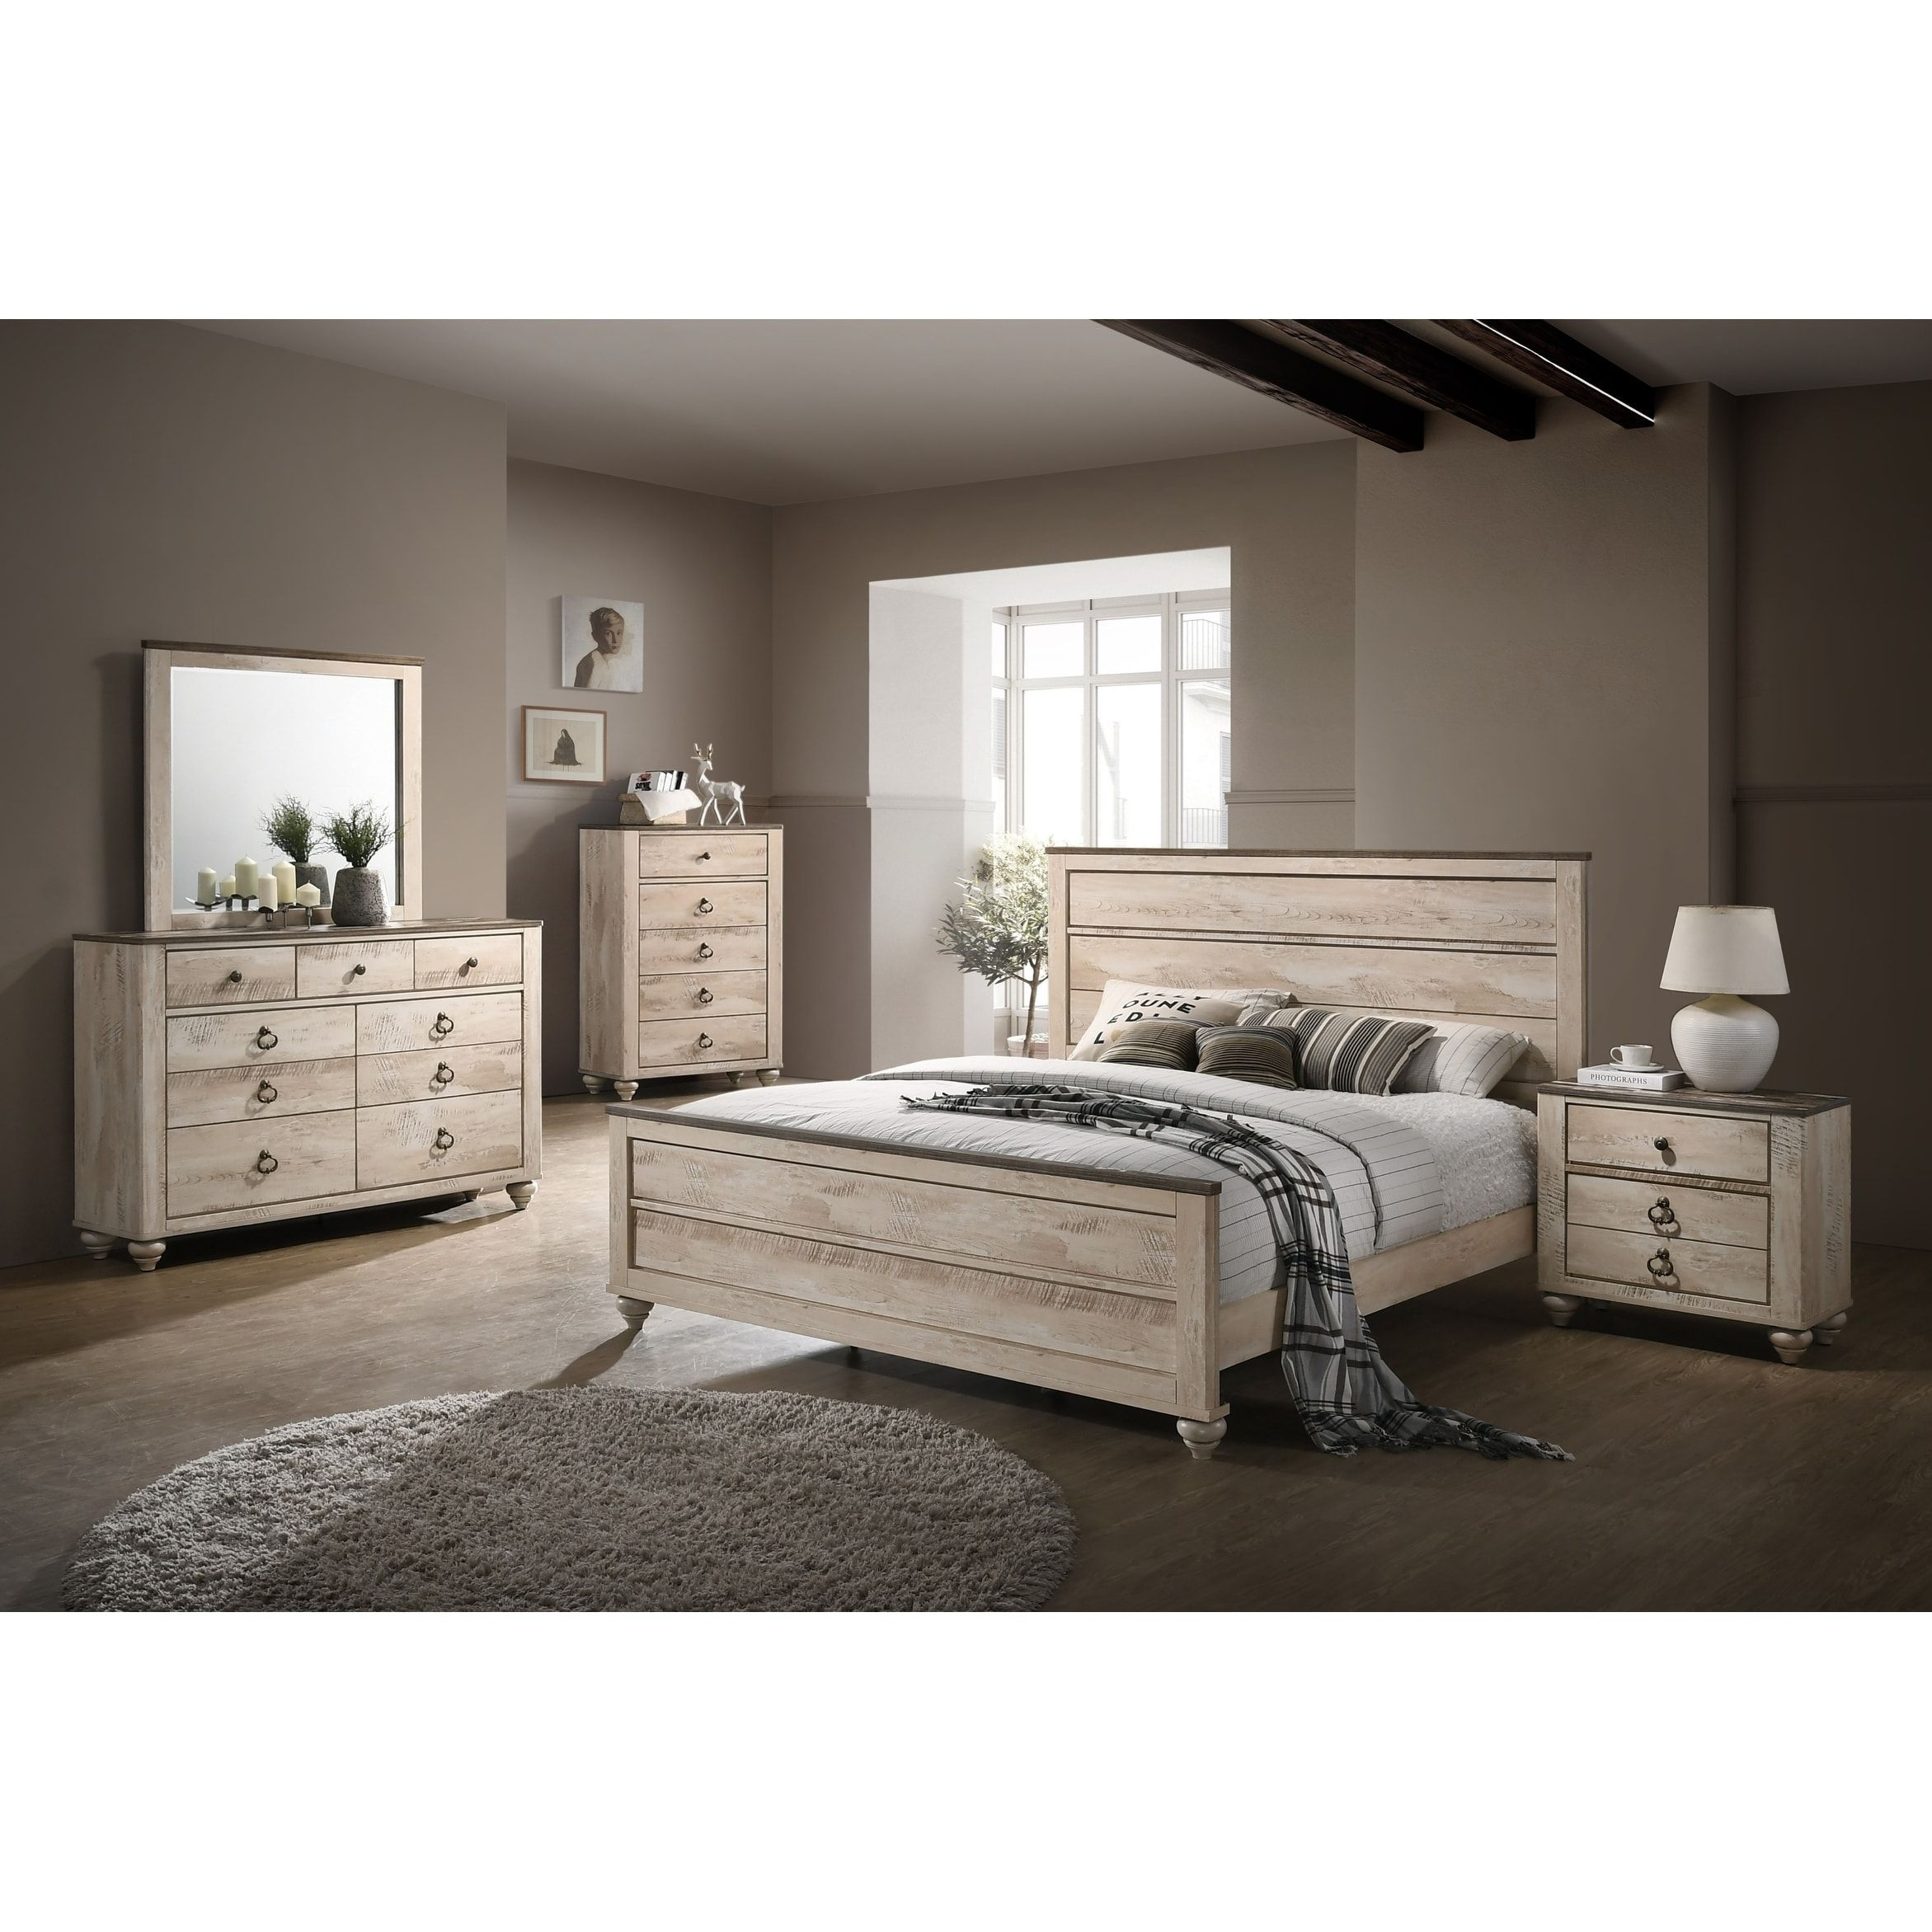 Imerland Contemporary White Wash Finish 5 Piece Bedroom Set Queen Bedroom Sets Bedroom Set Diy Furniture Bedroom